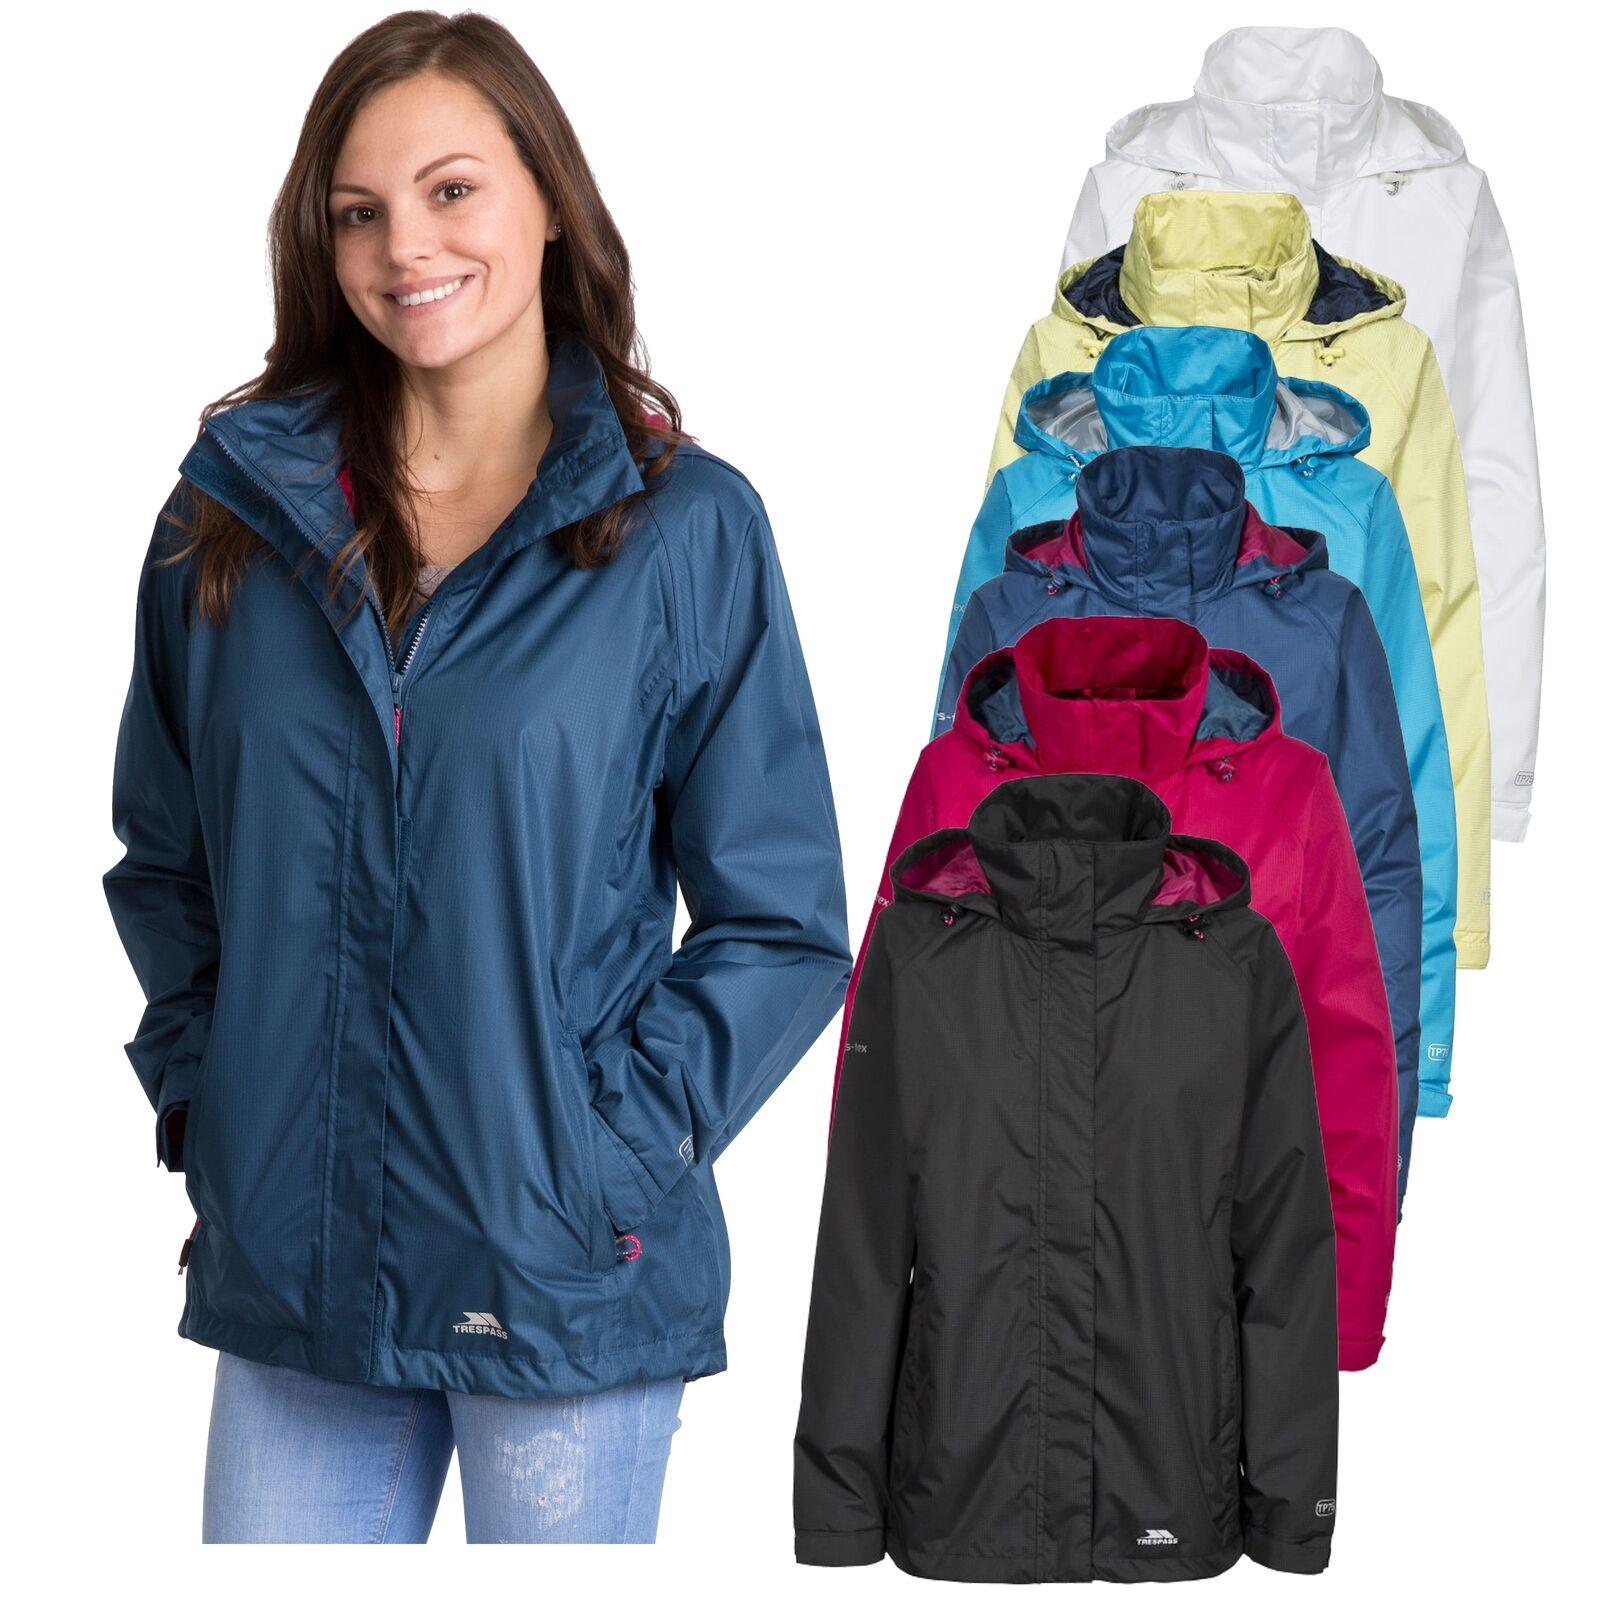 Trespass Womens Waterproof Jacket Ladies Raincoat XXS - XXXL Lanna II